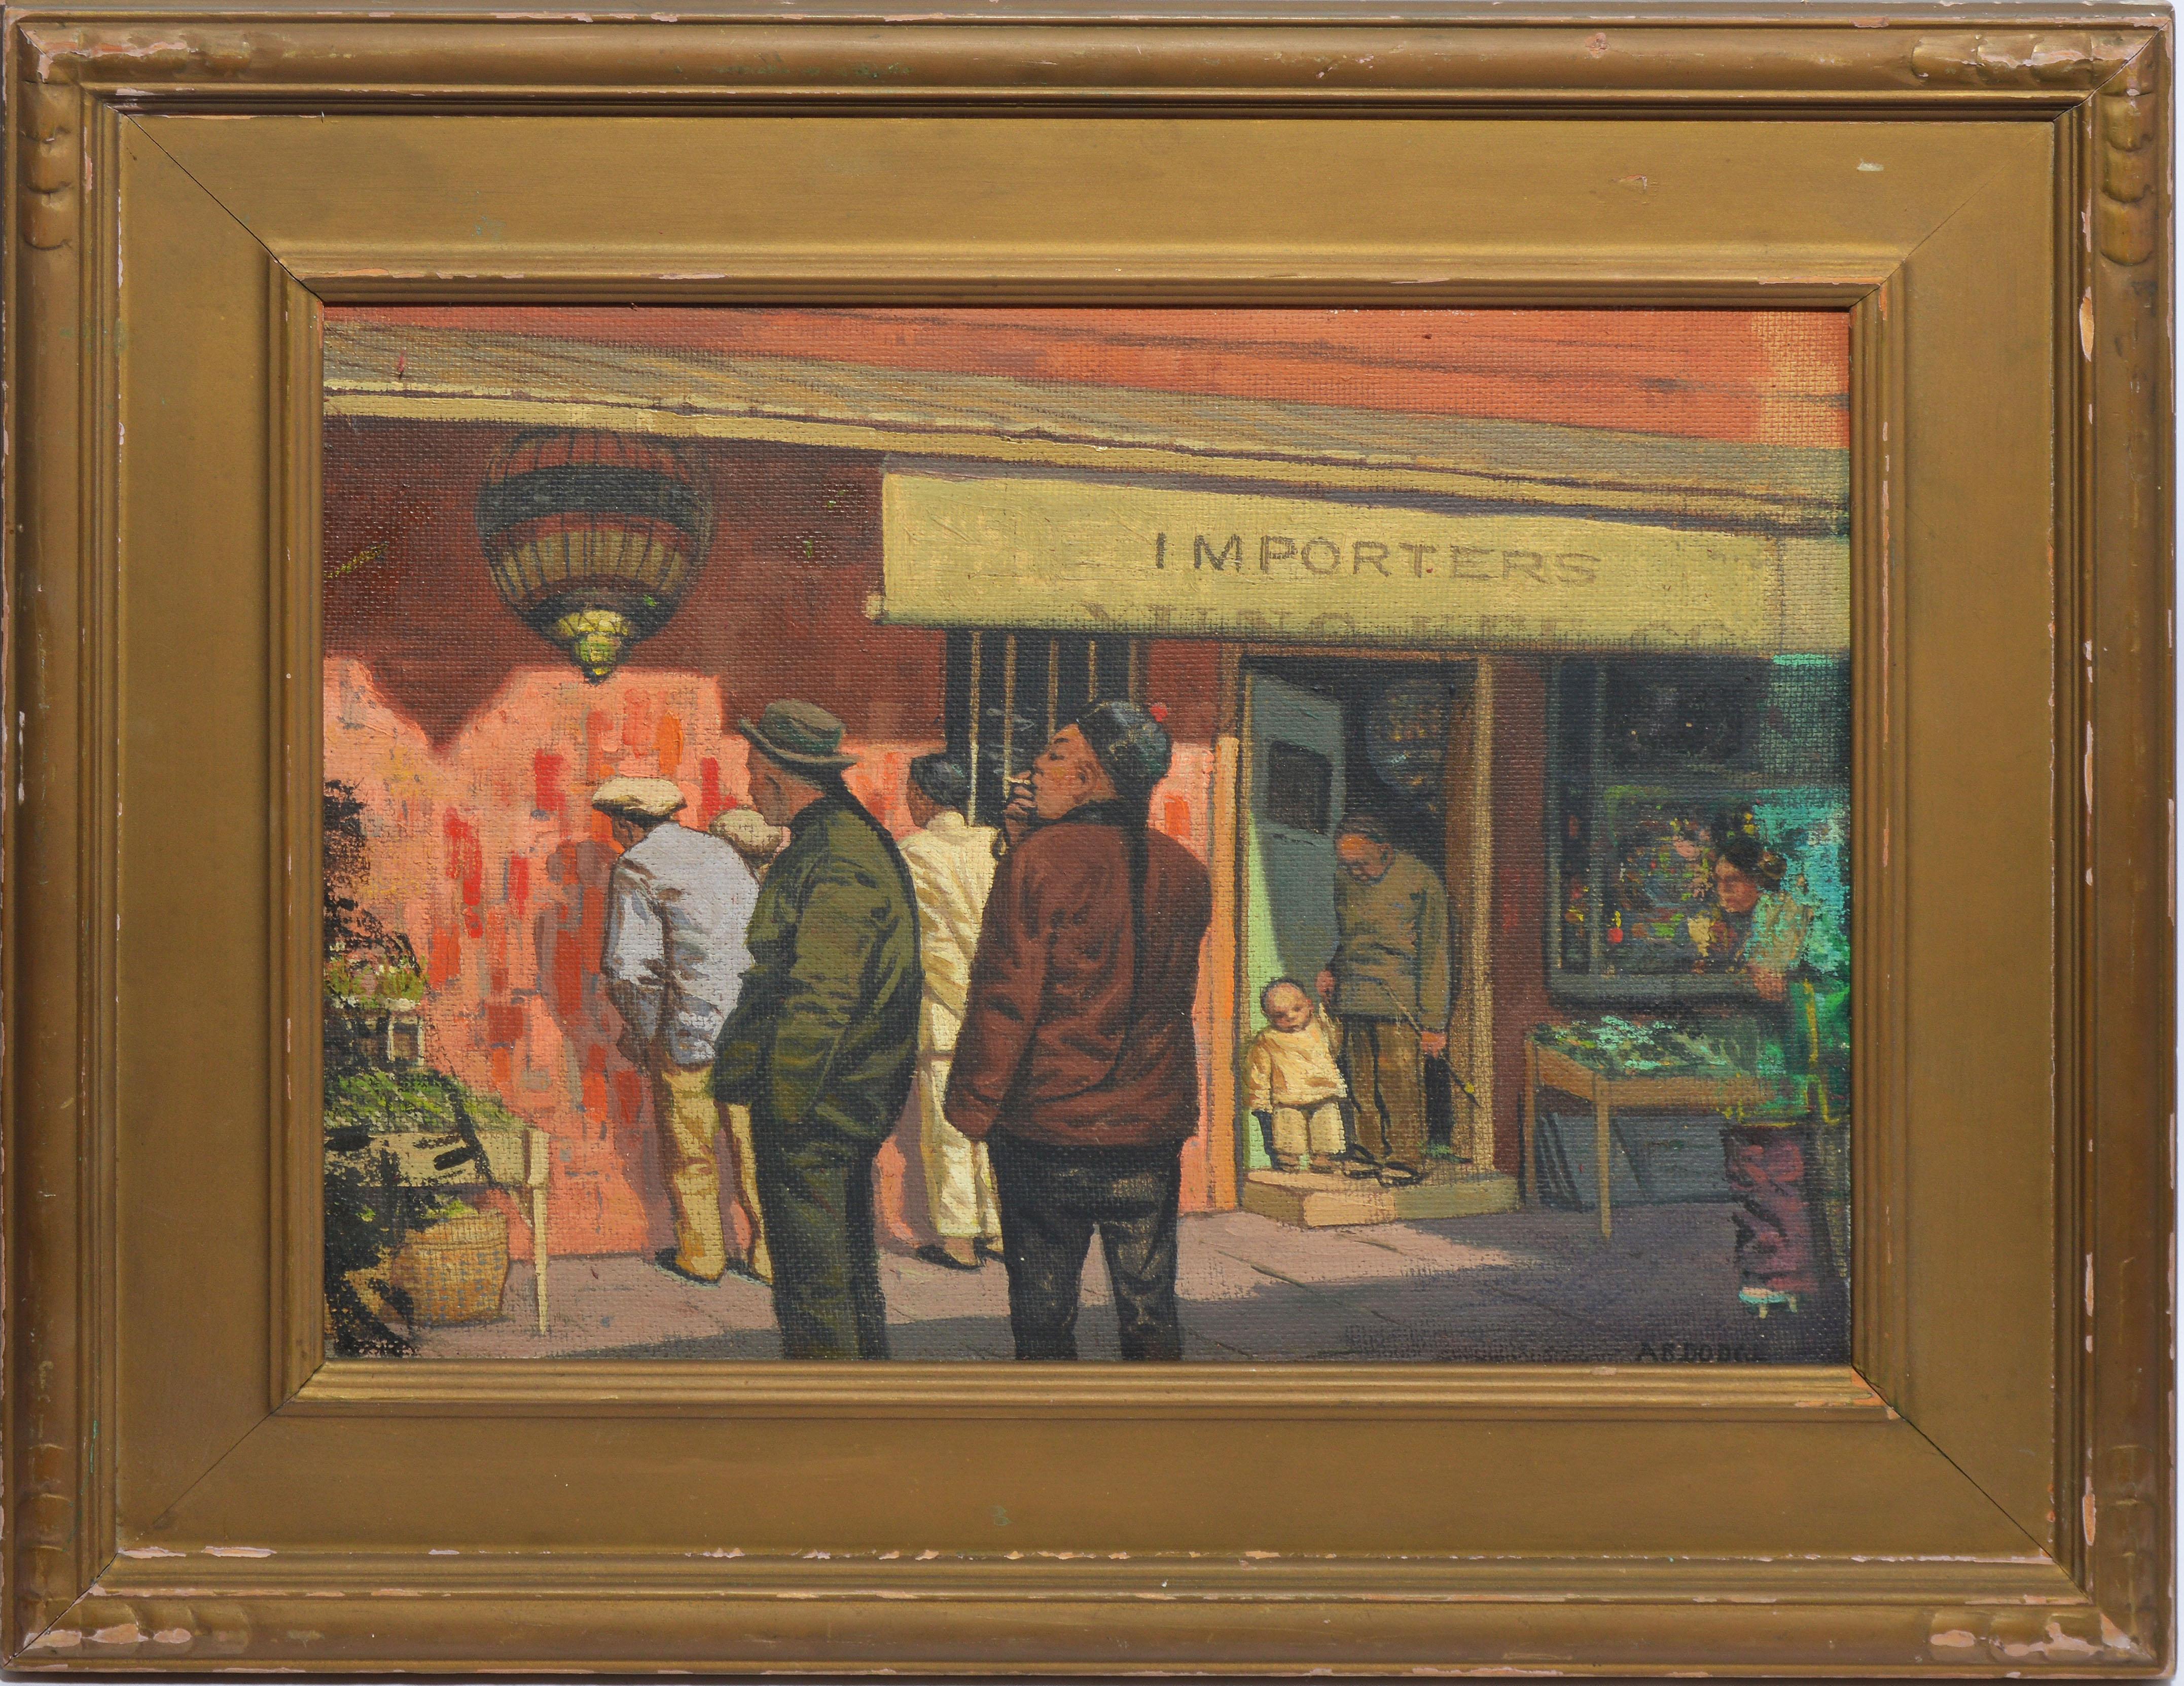 Antique American Modernist Street Scene, Chinatown San Francisco by Arthur Dodge